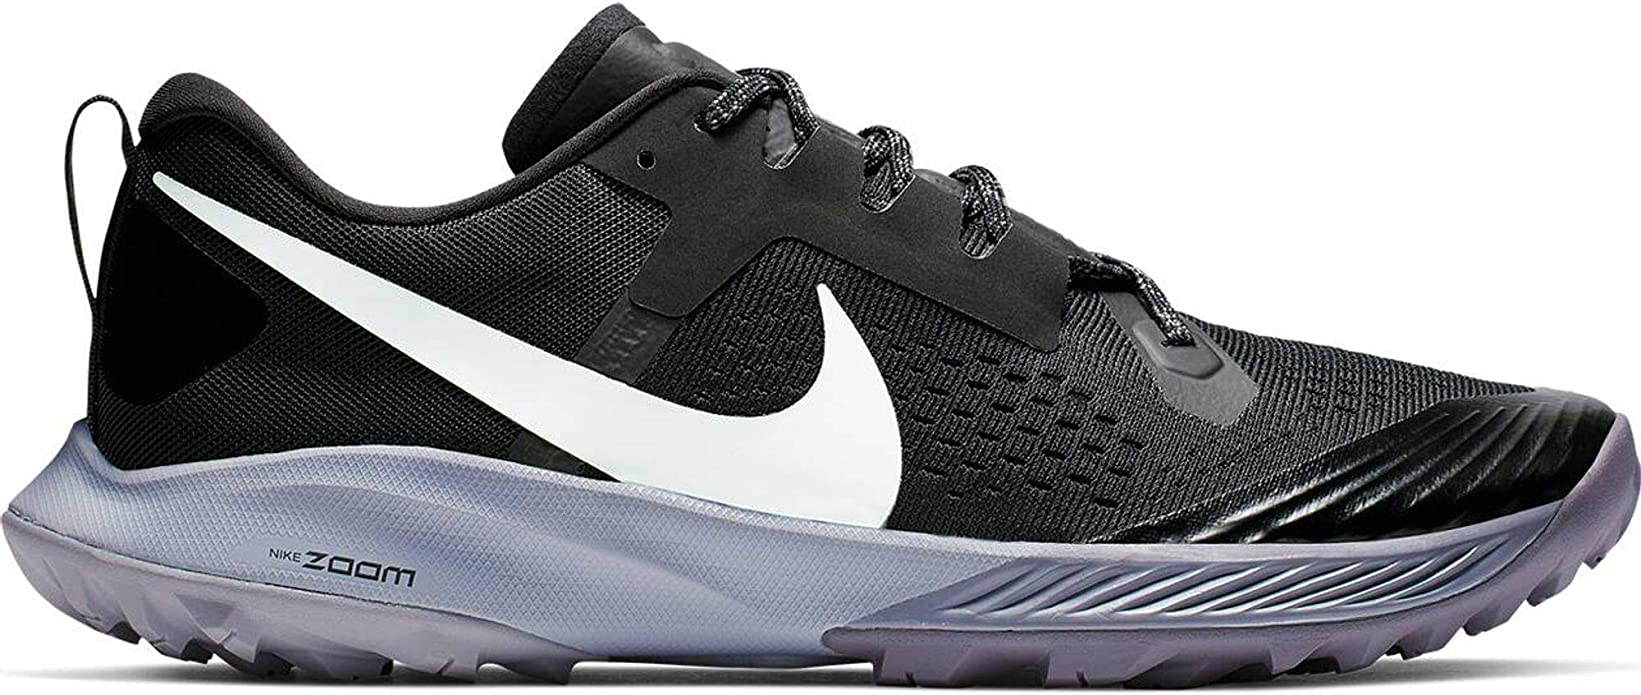 Nike Air Zoom Terra Kiger 5 Mens Aq2219